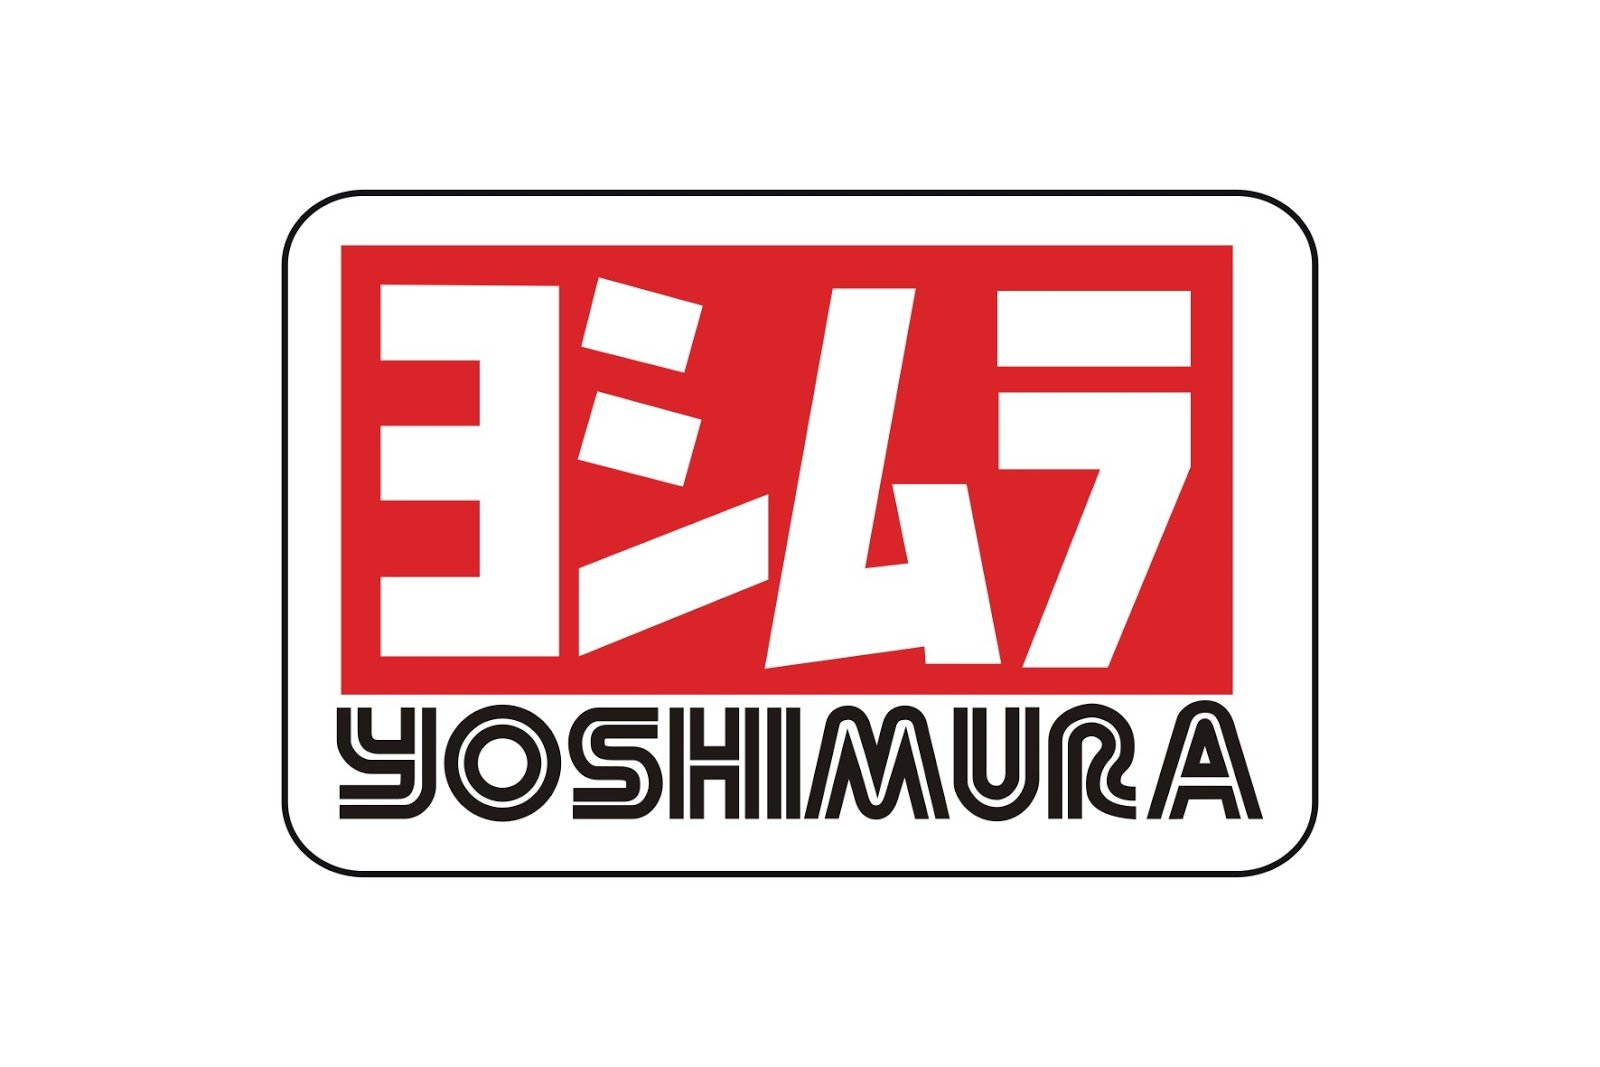 08-12 KAWASAKI EX250: Yoshimura Rearset Offset Brackets (BLACK)